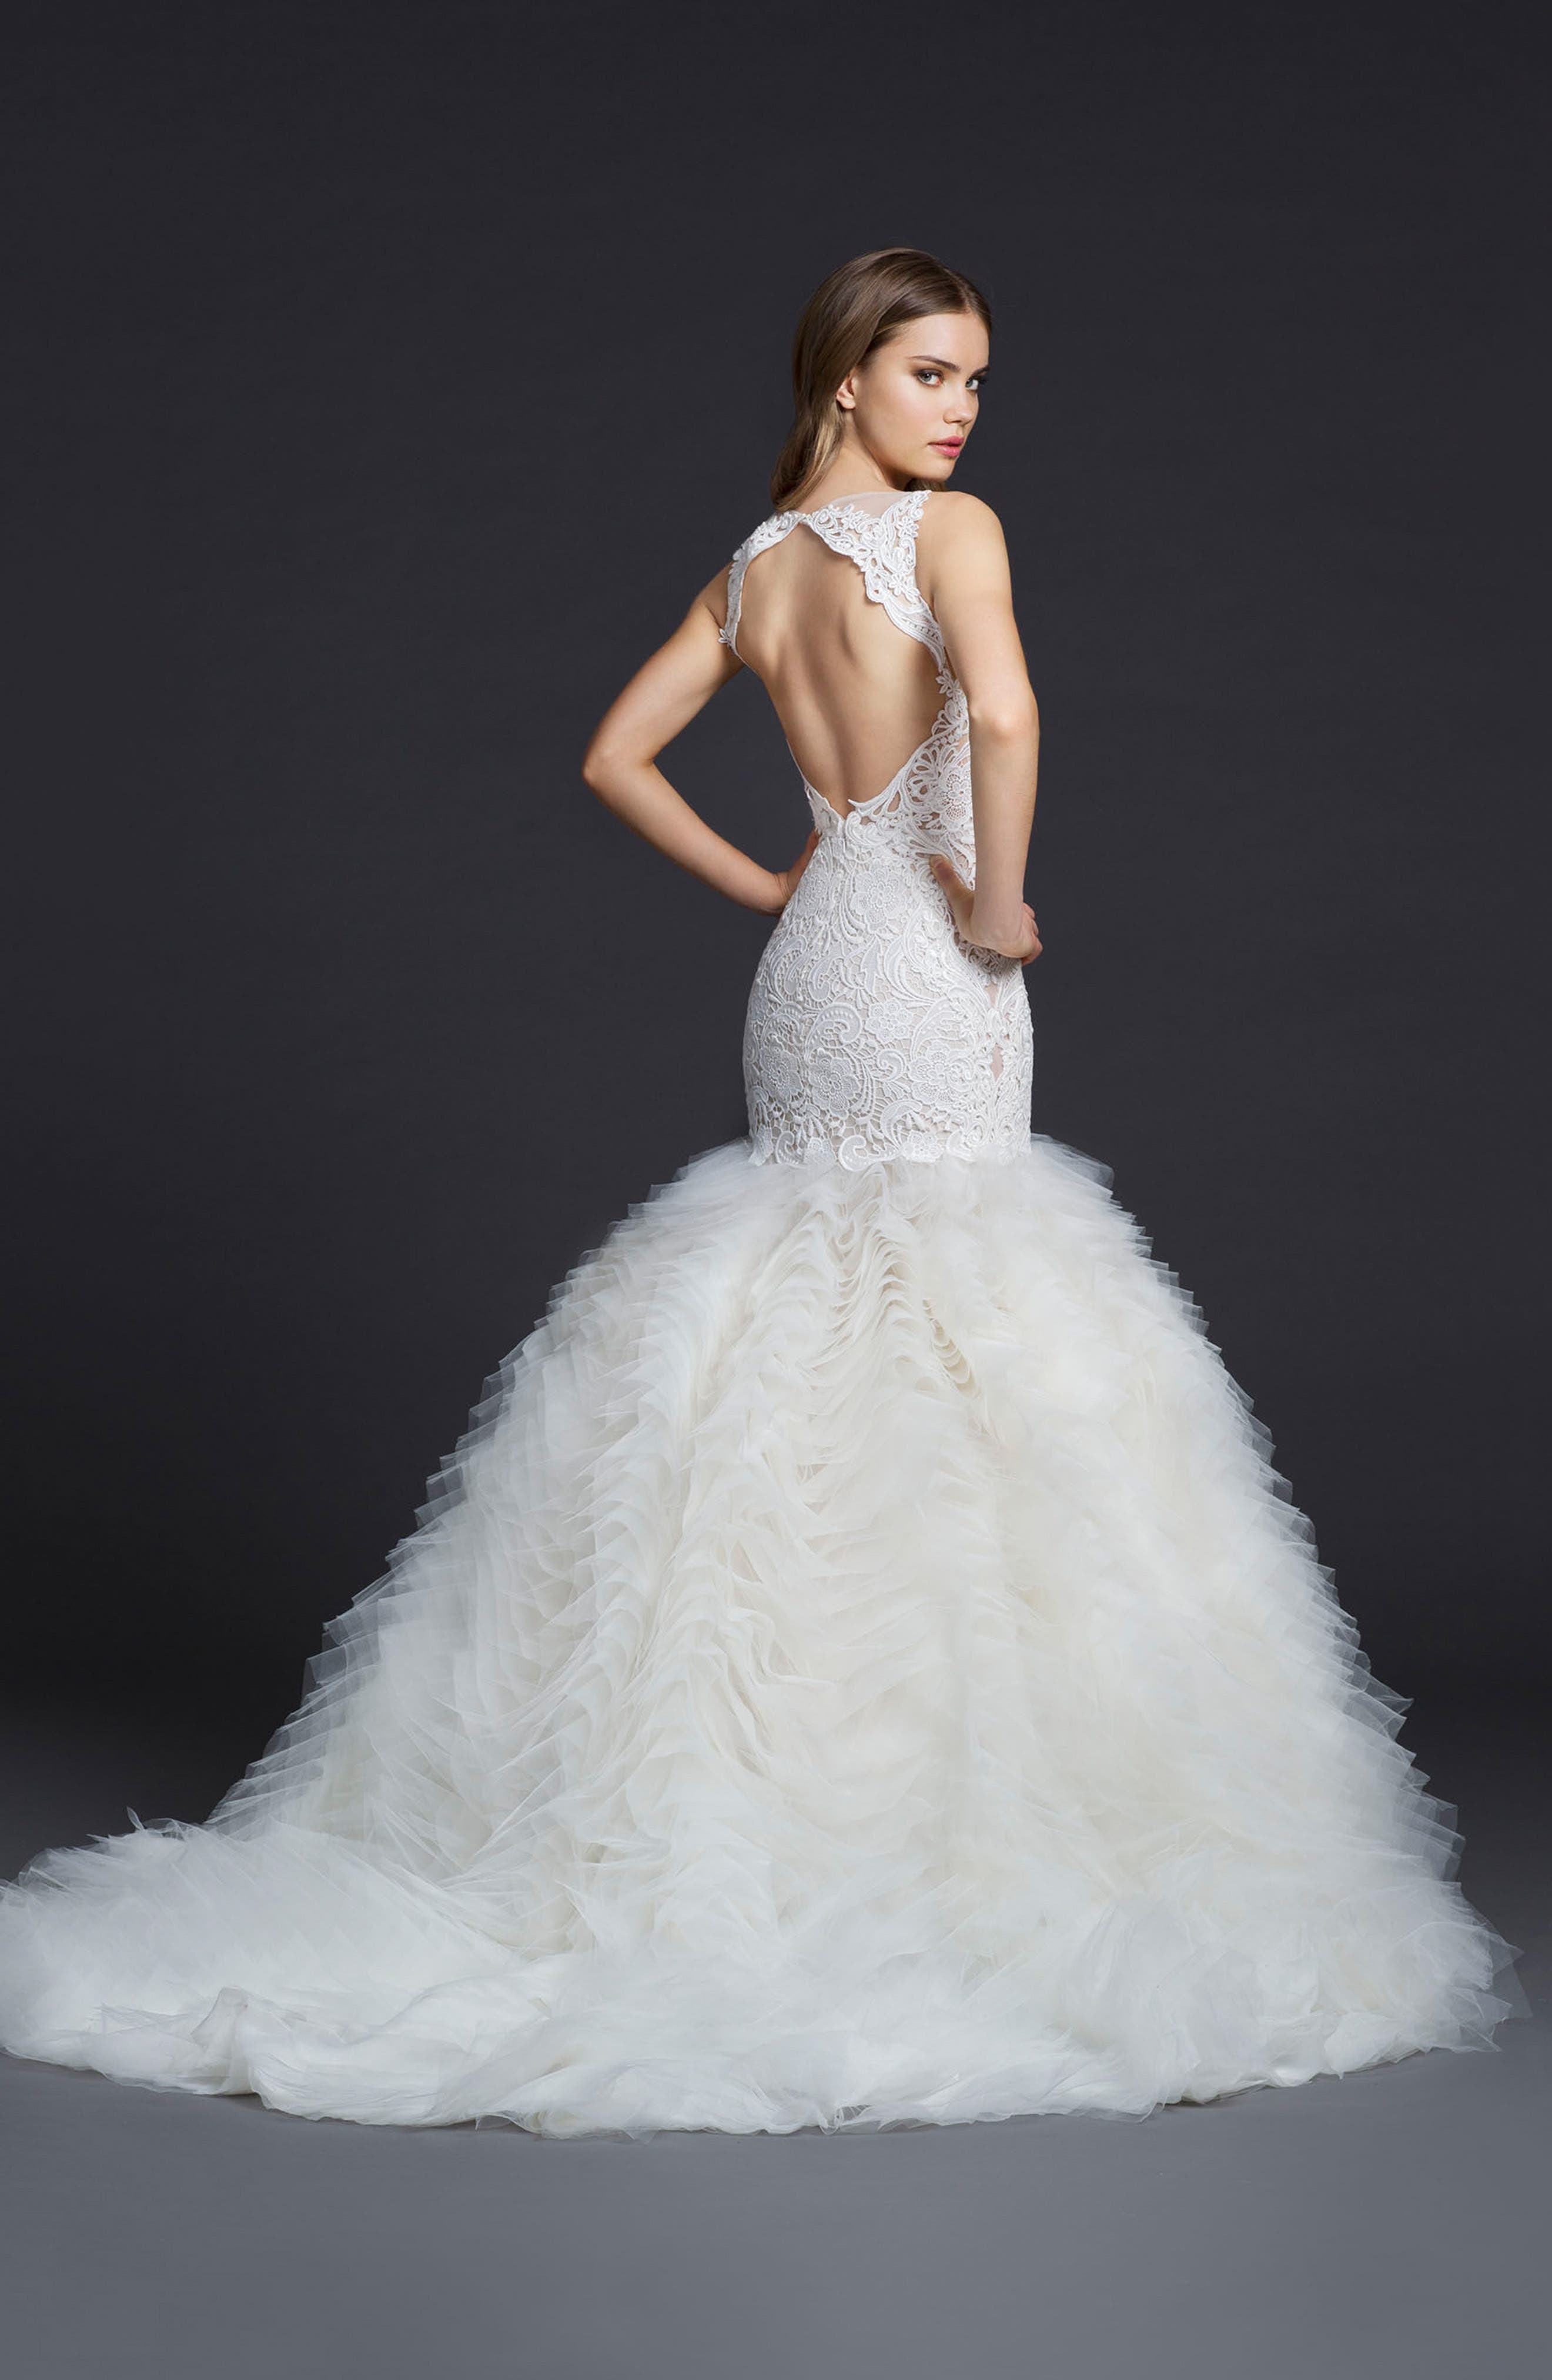 Mermaid Style Wedding Dresses with Sleeves